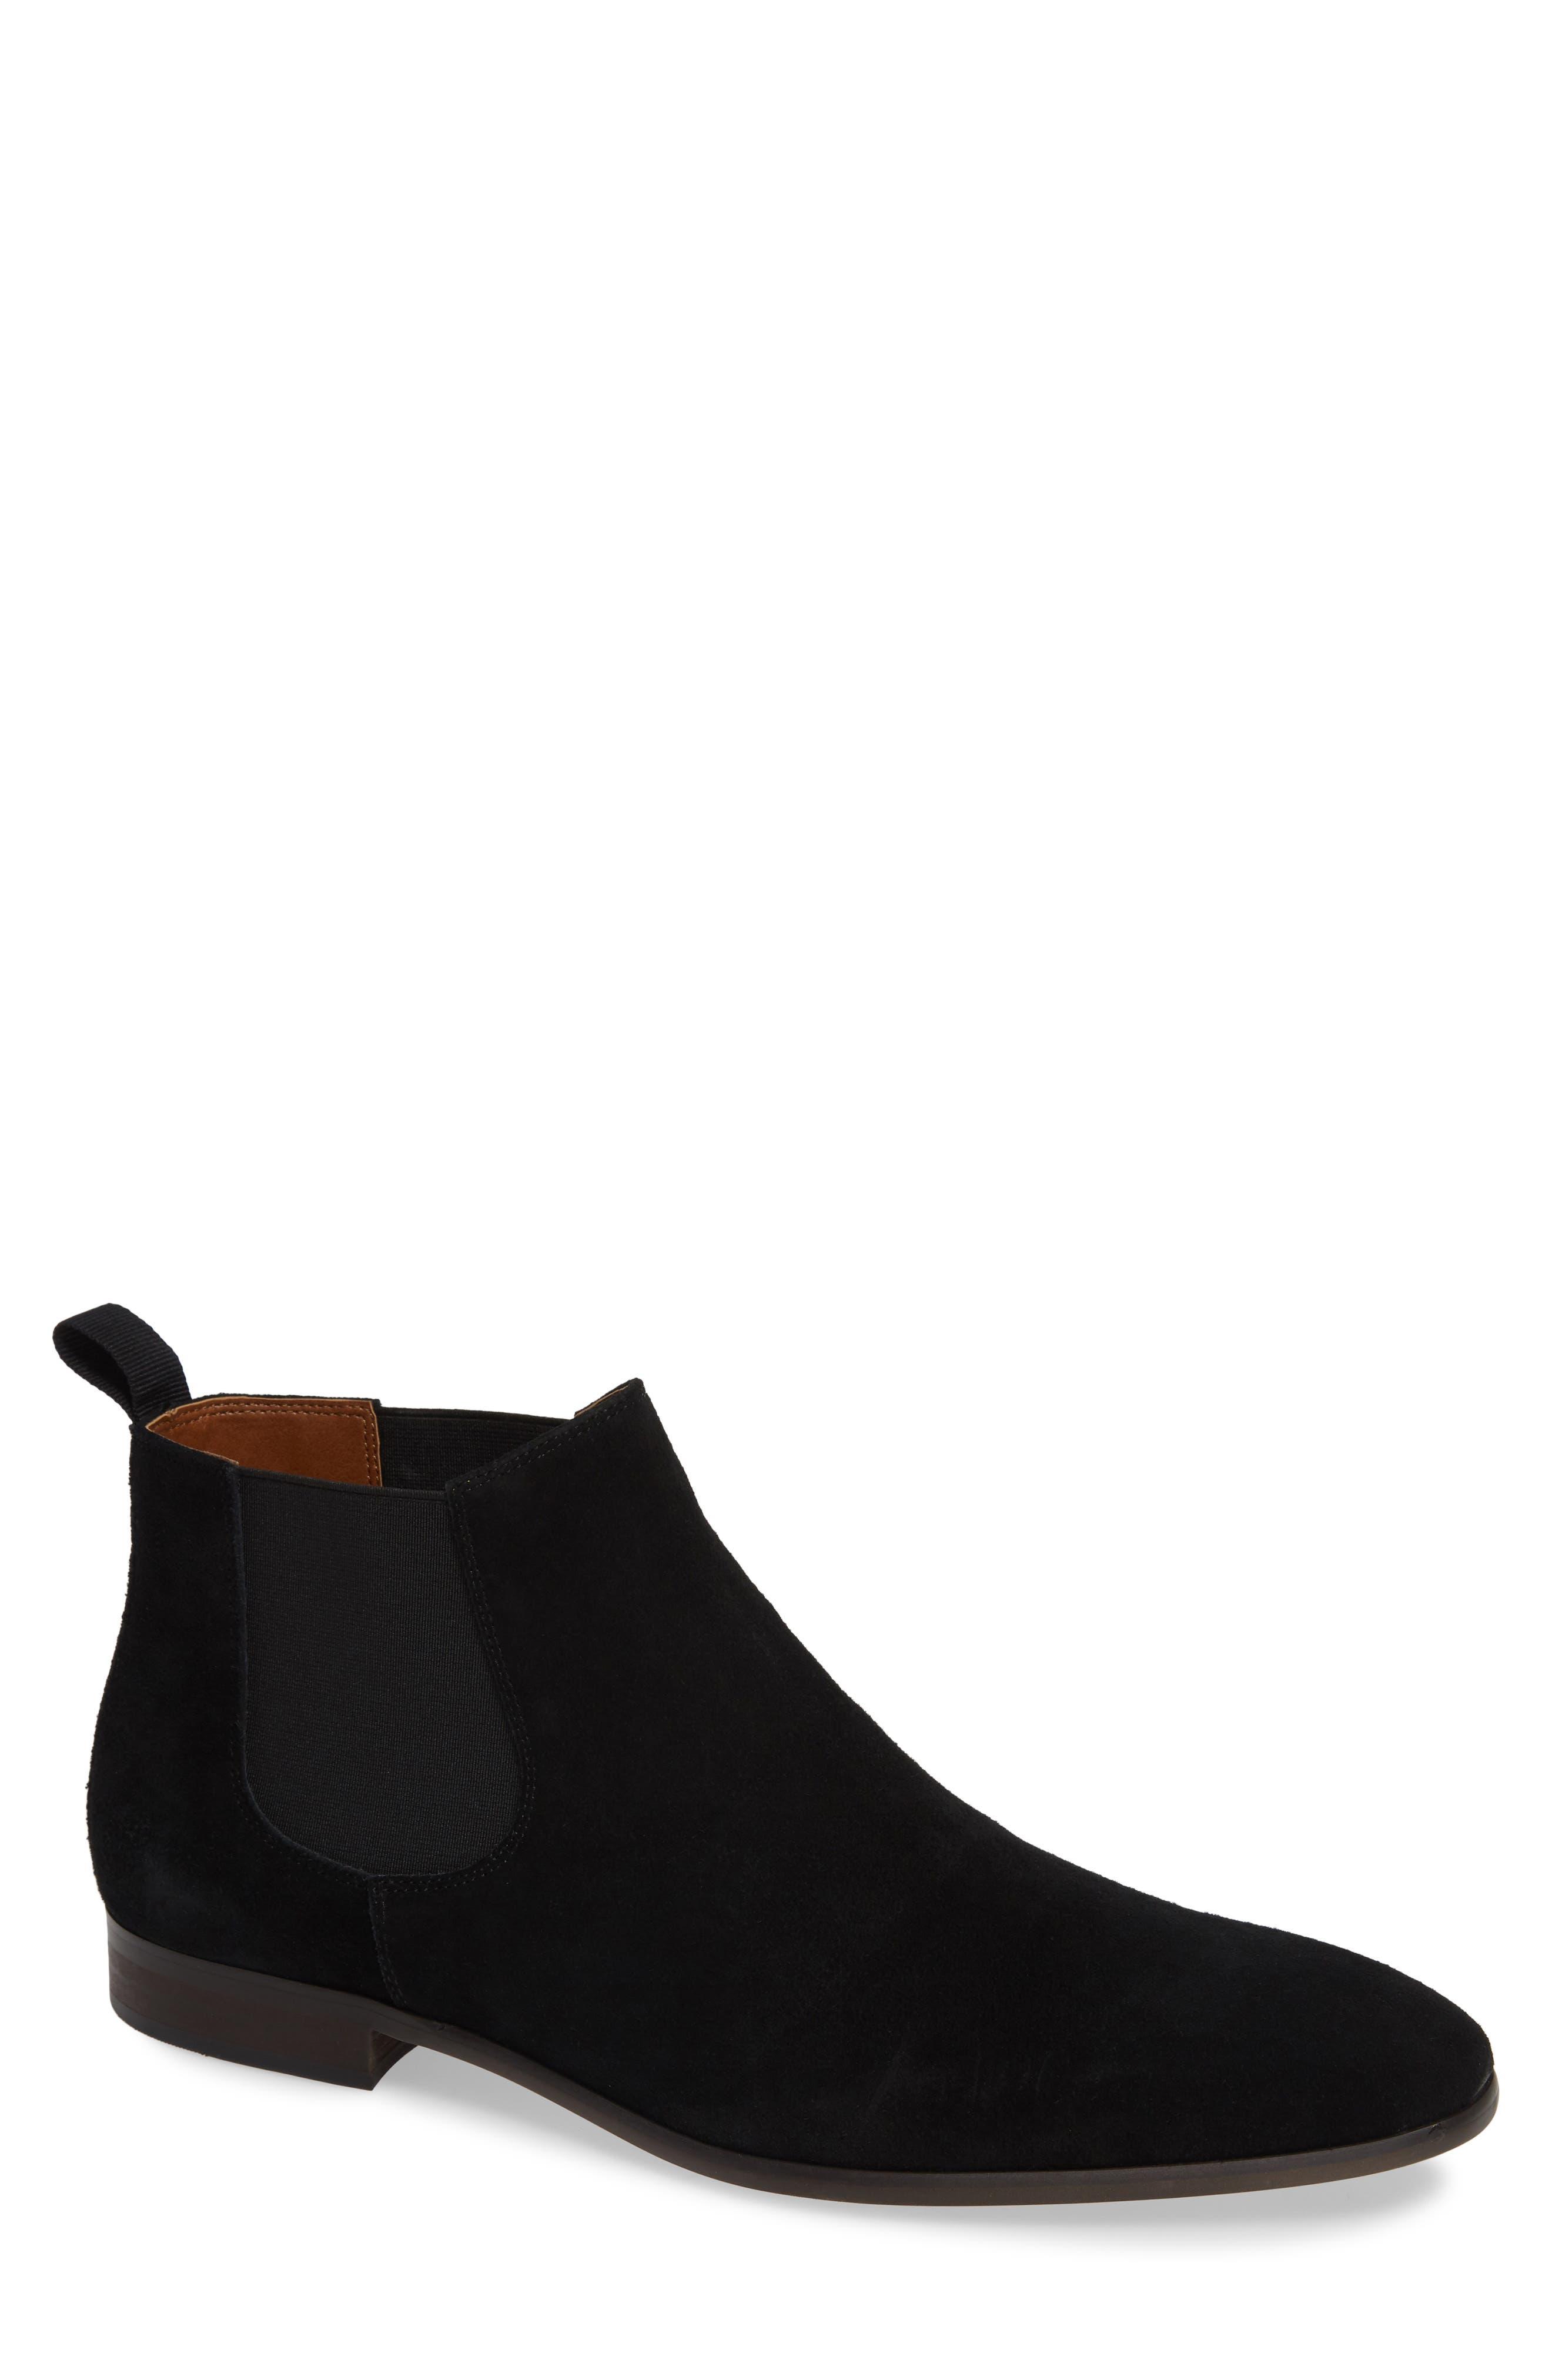 Edward Chelsea Boot,                             Main thumbnail 1, color,                             BLACK SUEDE